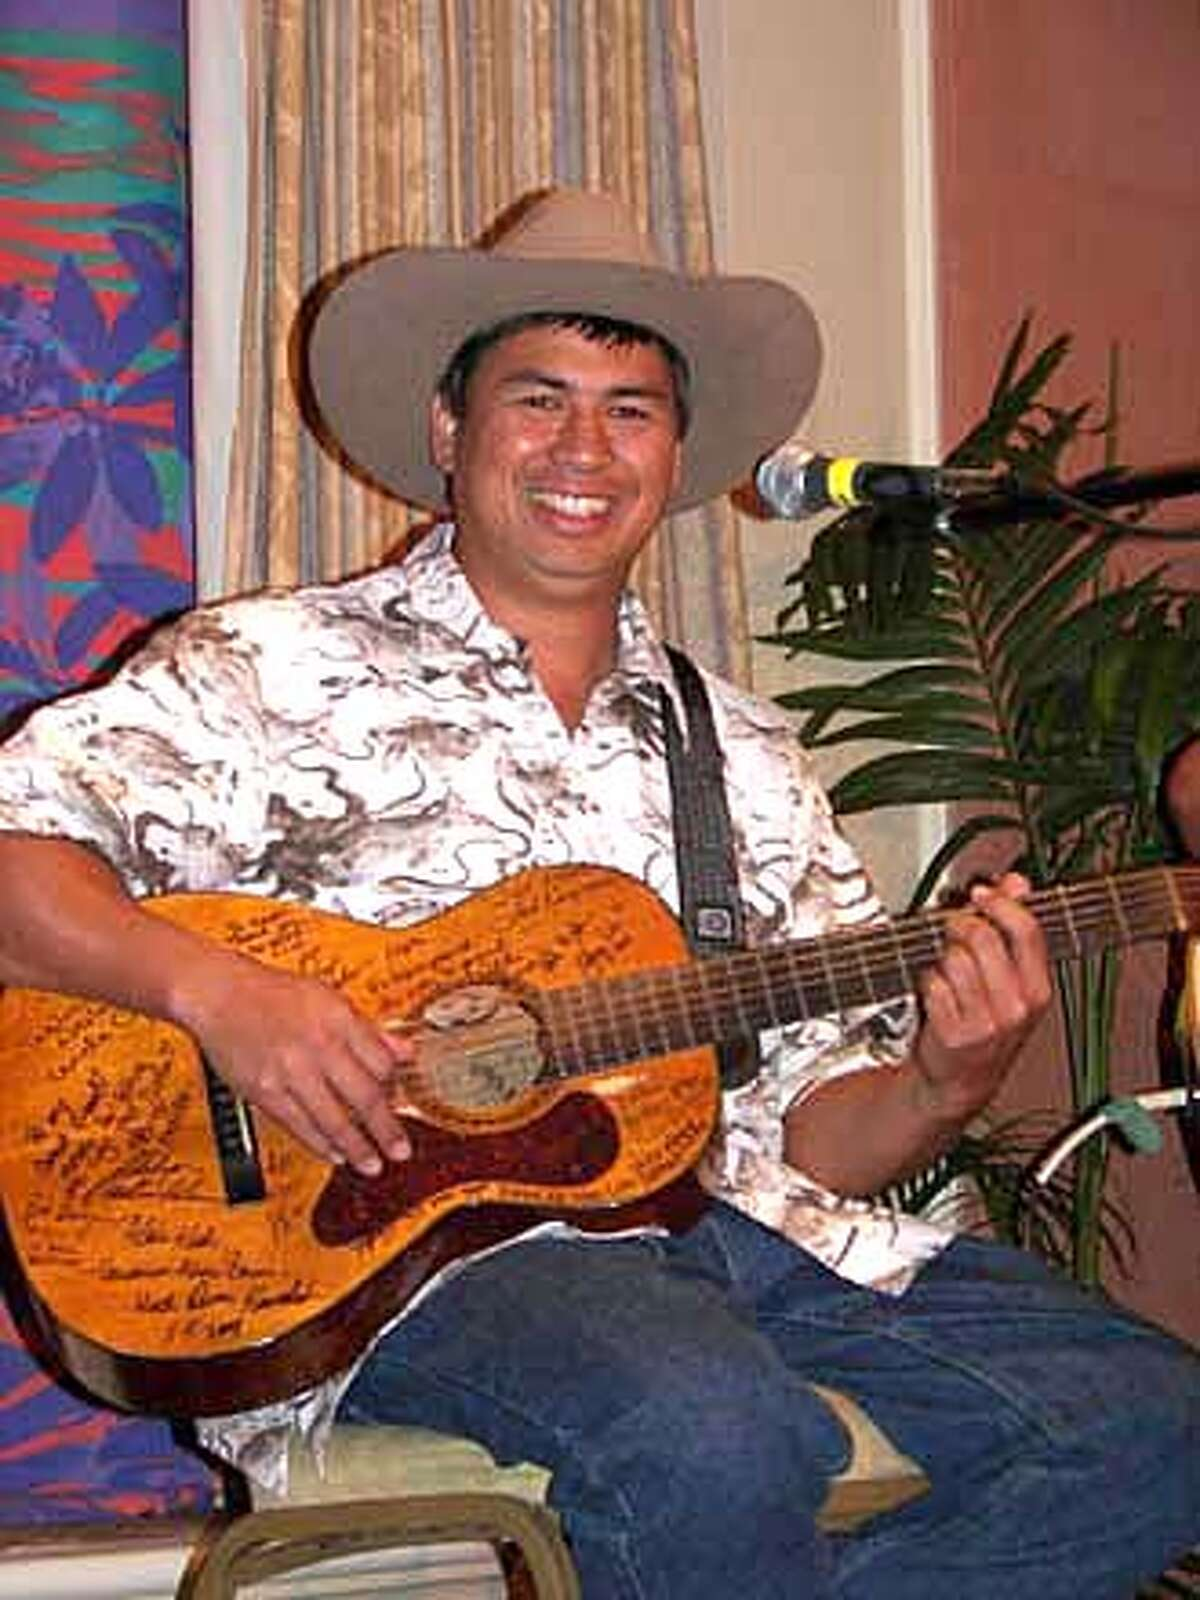 TRAVEL HAWAII -- Keoki Kahumoku, slack-key guitarist, singer and songwriter, performs regularly at the Napili Kai Beach Resort on Maui and teaches workshops at the Kahumoku Ohana Music Camp in Pahalo on the Big Island of Hawaii.